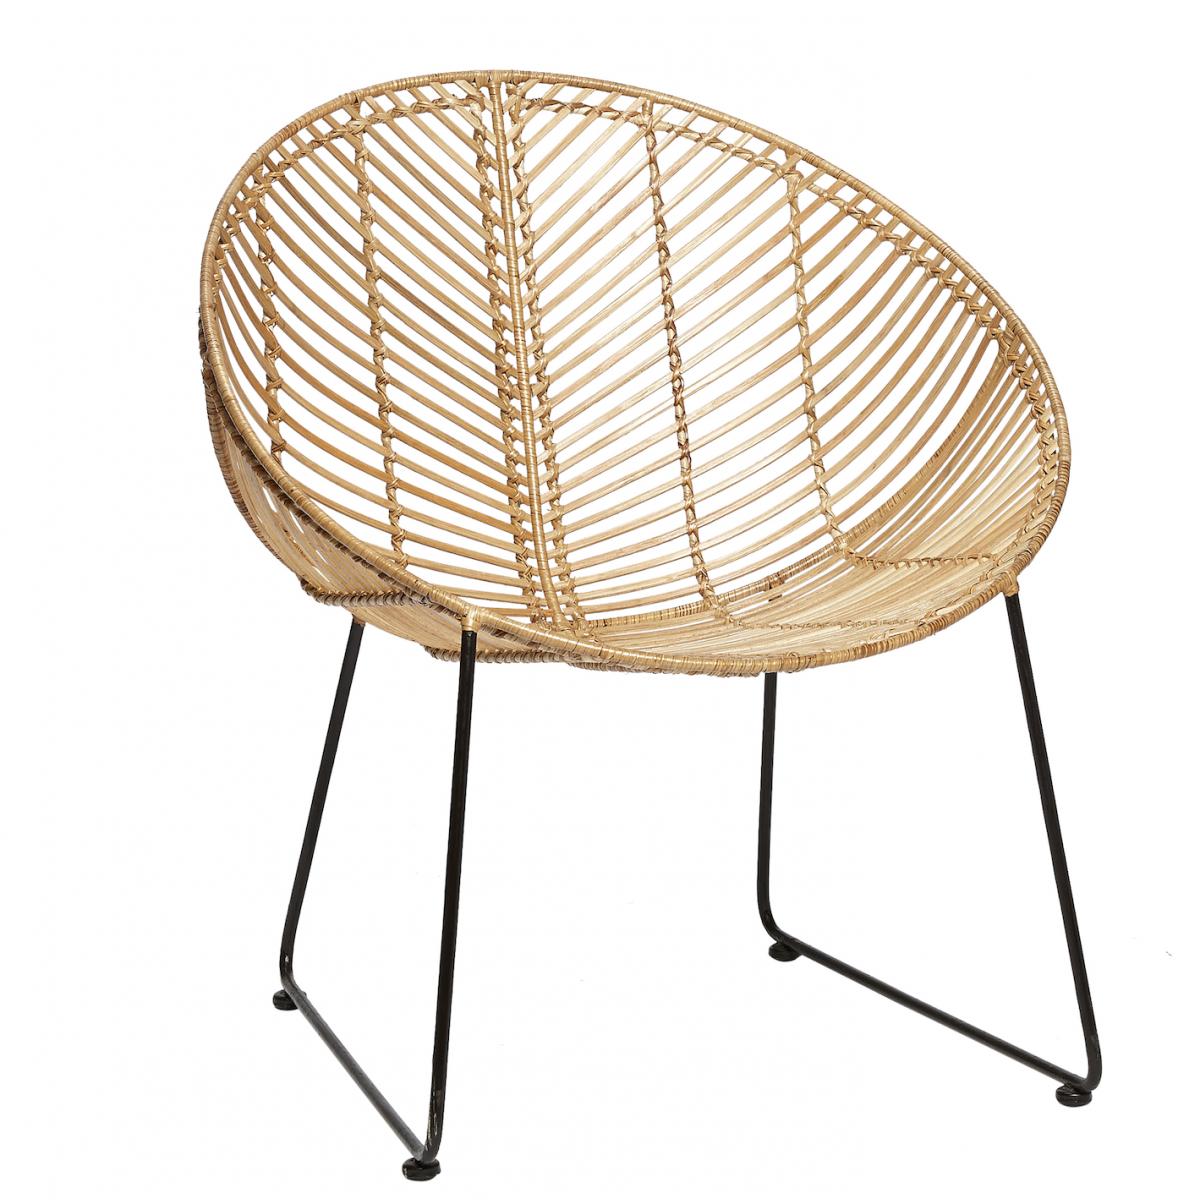 Meuble Design Scandinave Chaise Ronde En Rotin Naturel71x67xh77cm Fauteuil Rotin Decoration Salon Canape Noir Meuble Osier